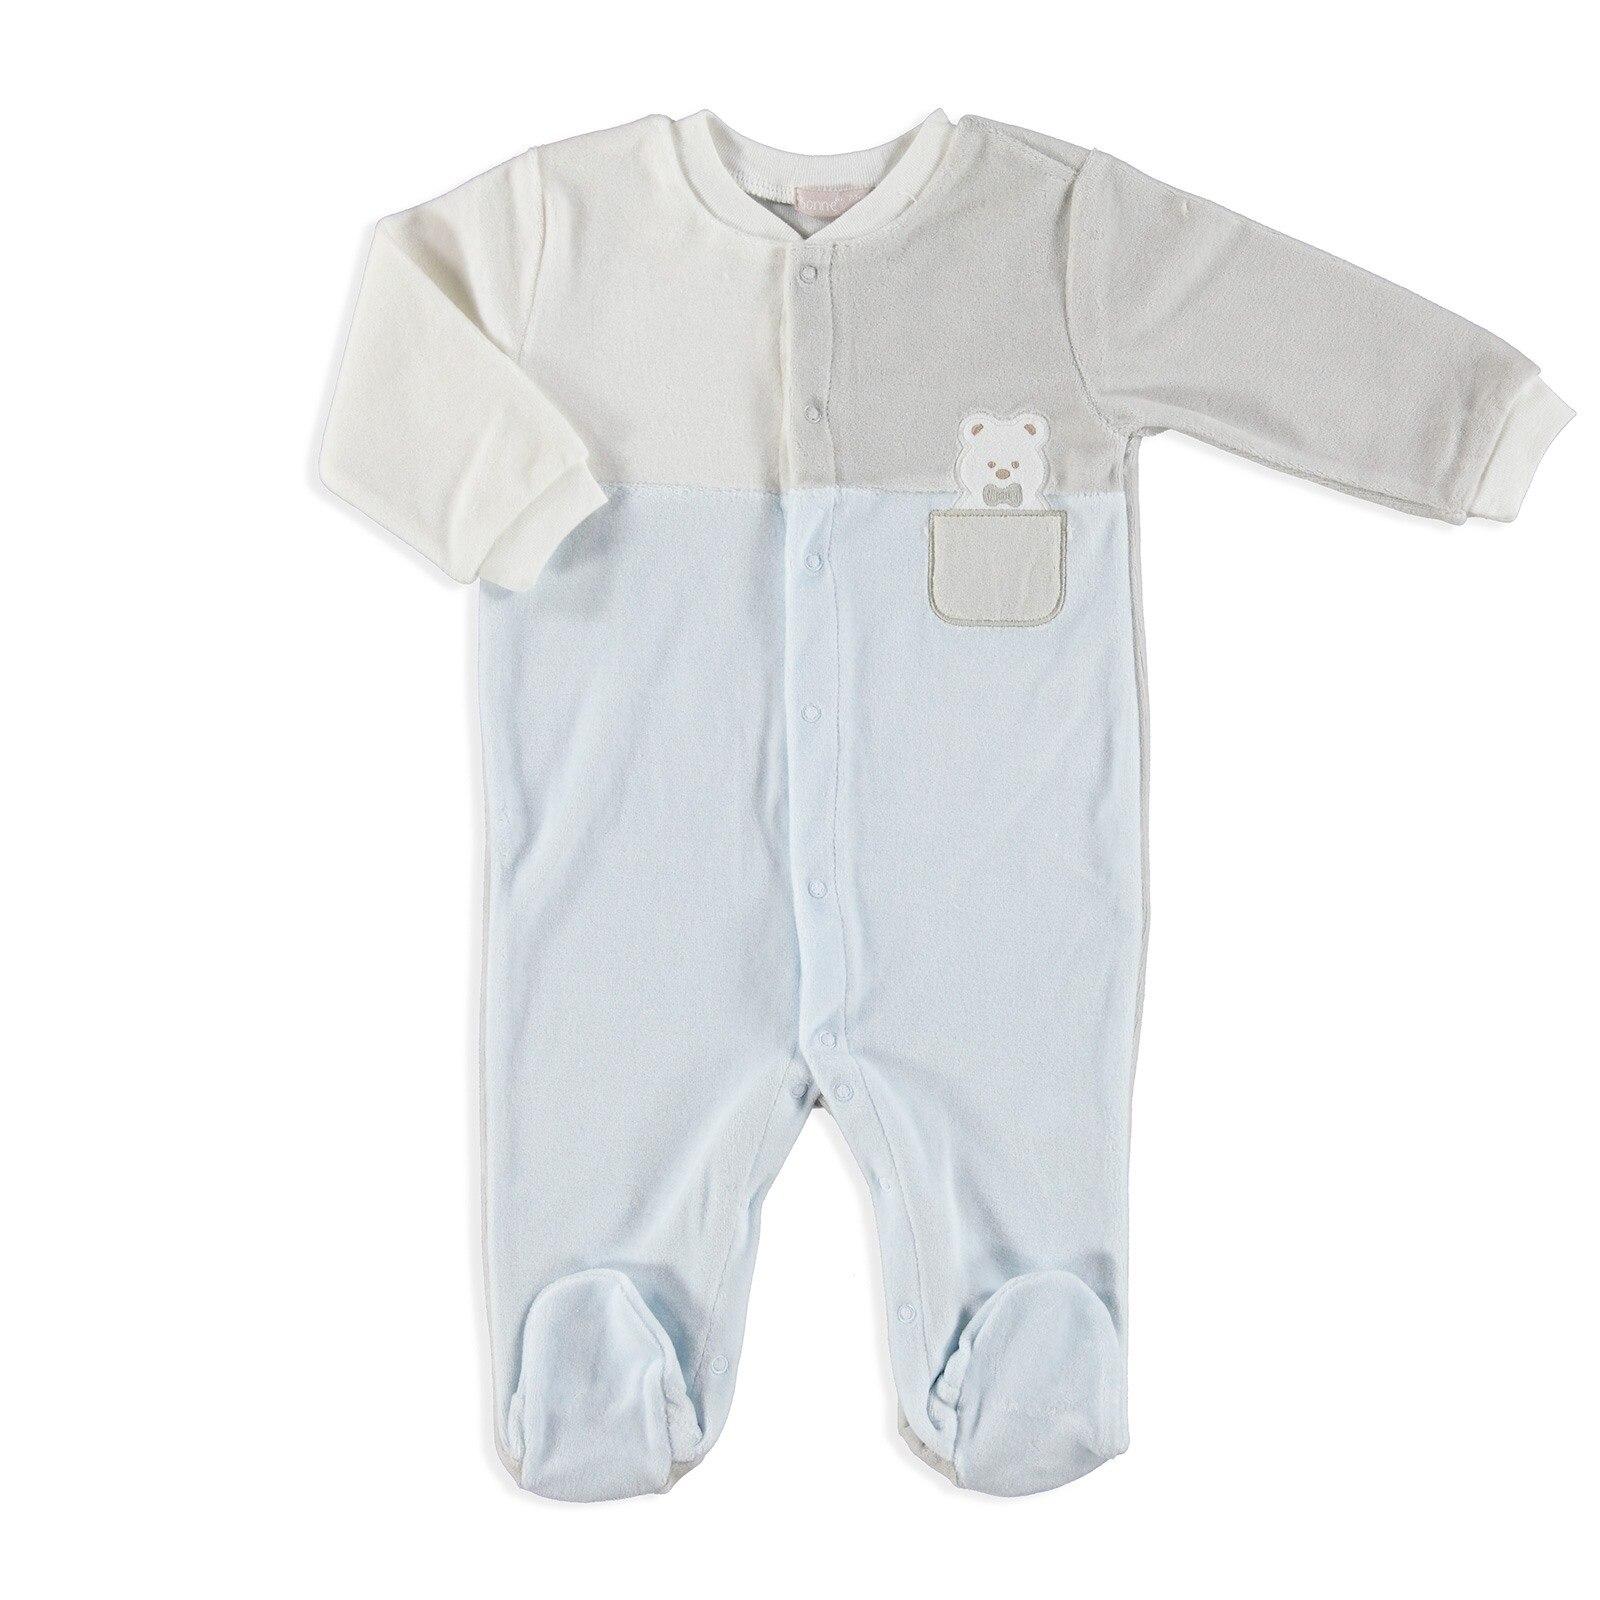 Ebebek BONNE Teddy Bear Embroidered Baby Romper